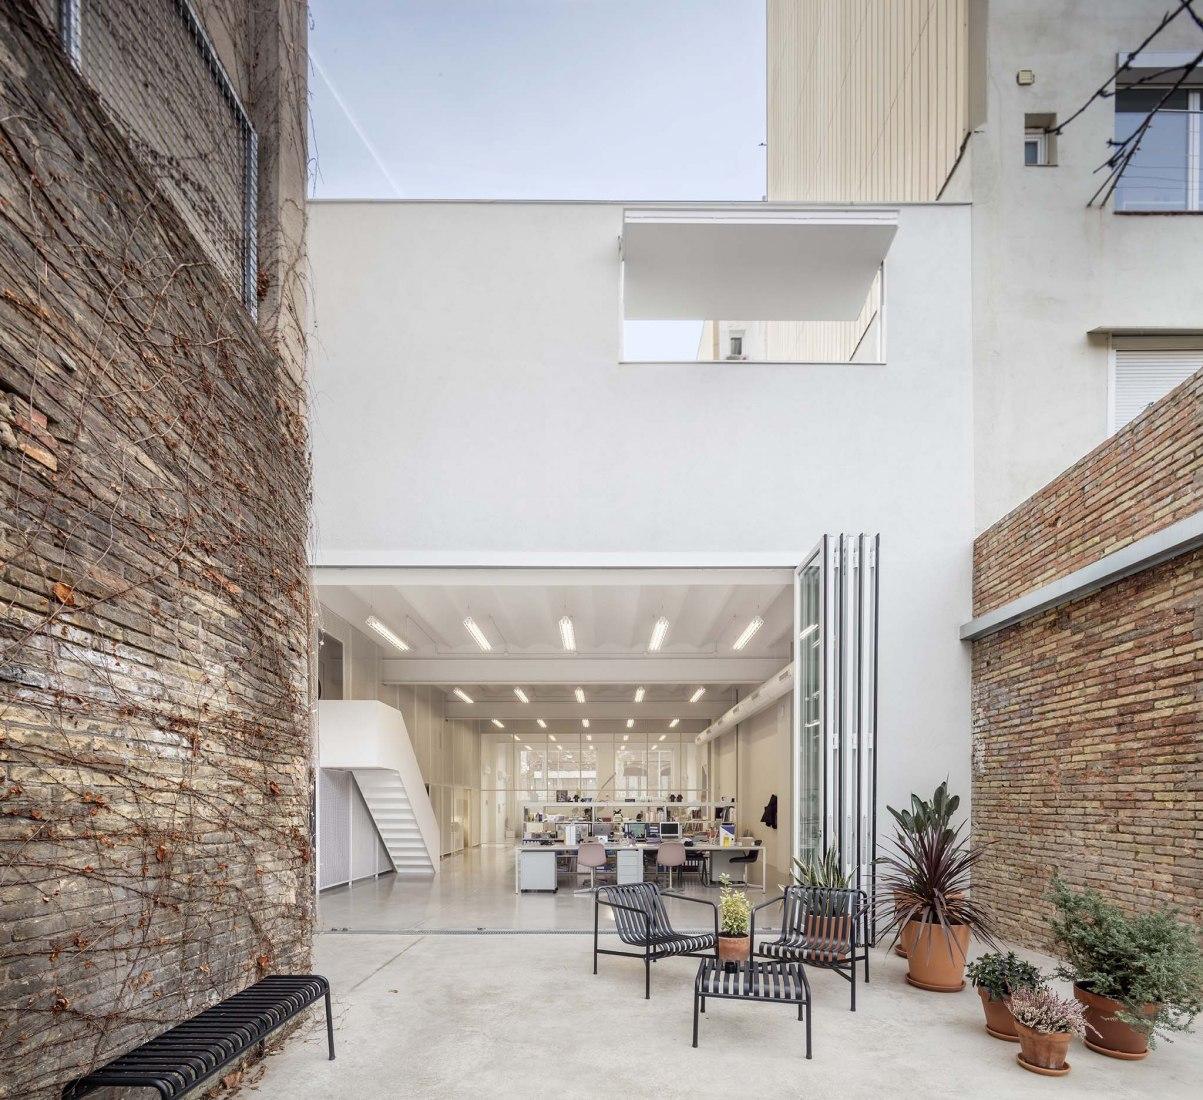 Warehouse Barcelona by Thomas Raynaud architectes, Paul Devarrieux architecte. Photograph by Àdria Goula.